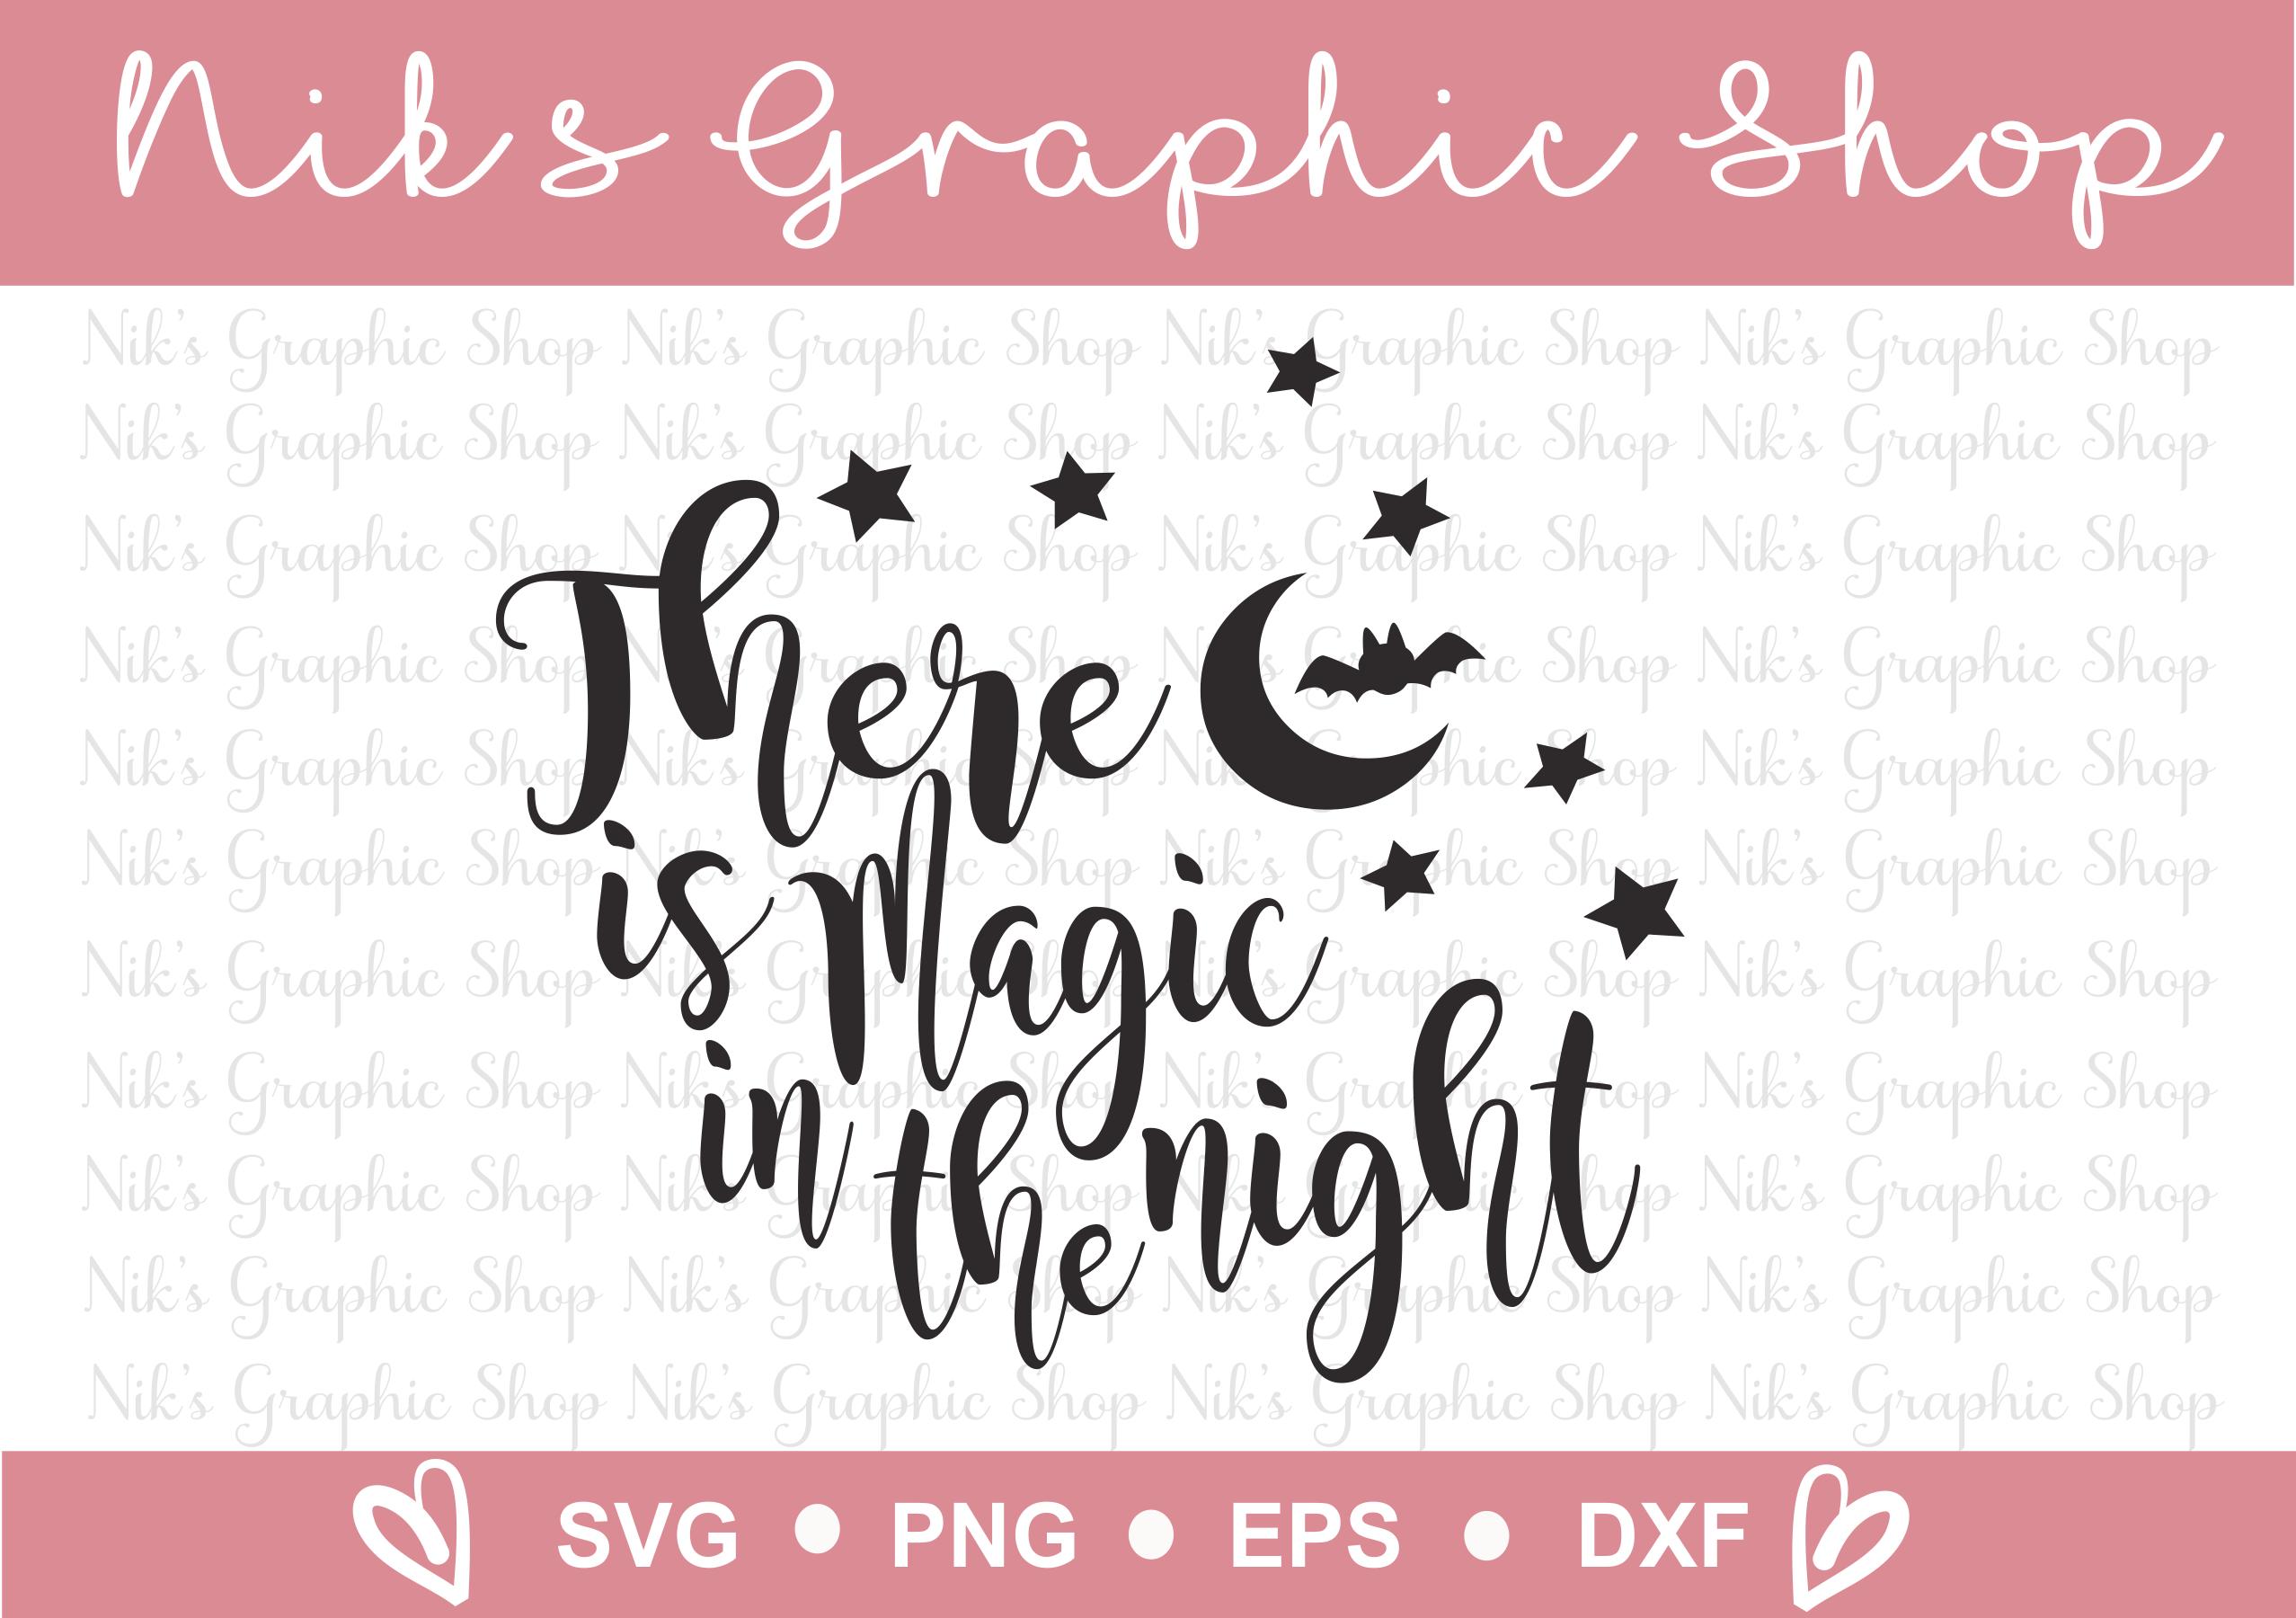 Halloween SVG, Witch SVG, Ghost SVG, Halloween Svg Bundle example image 6